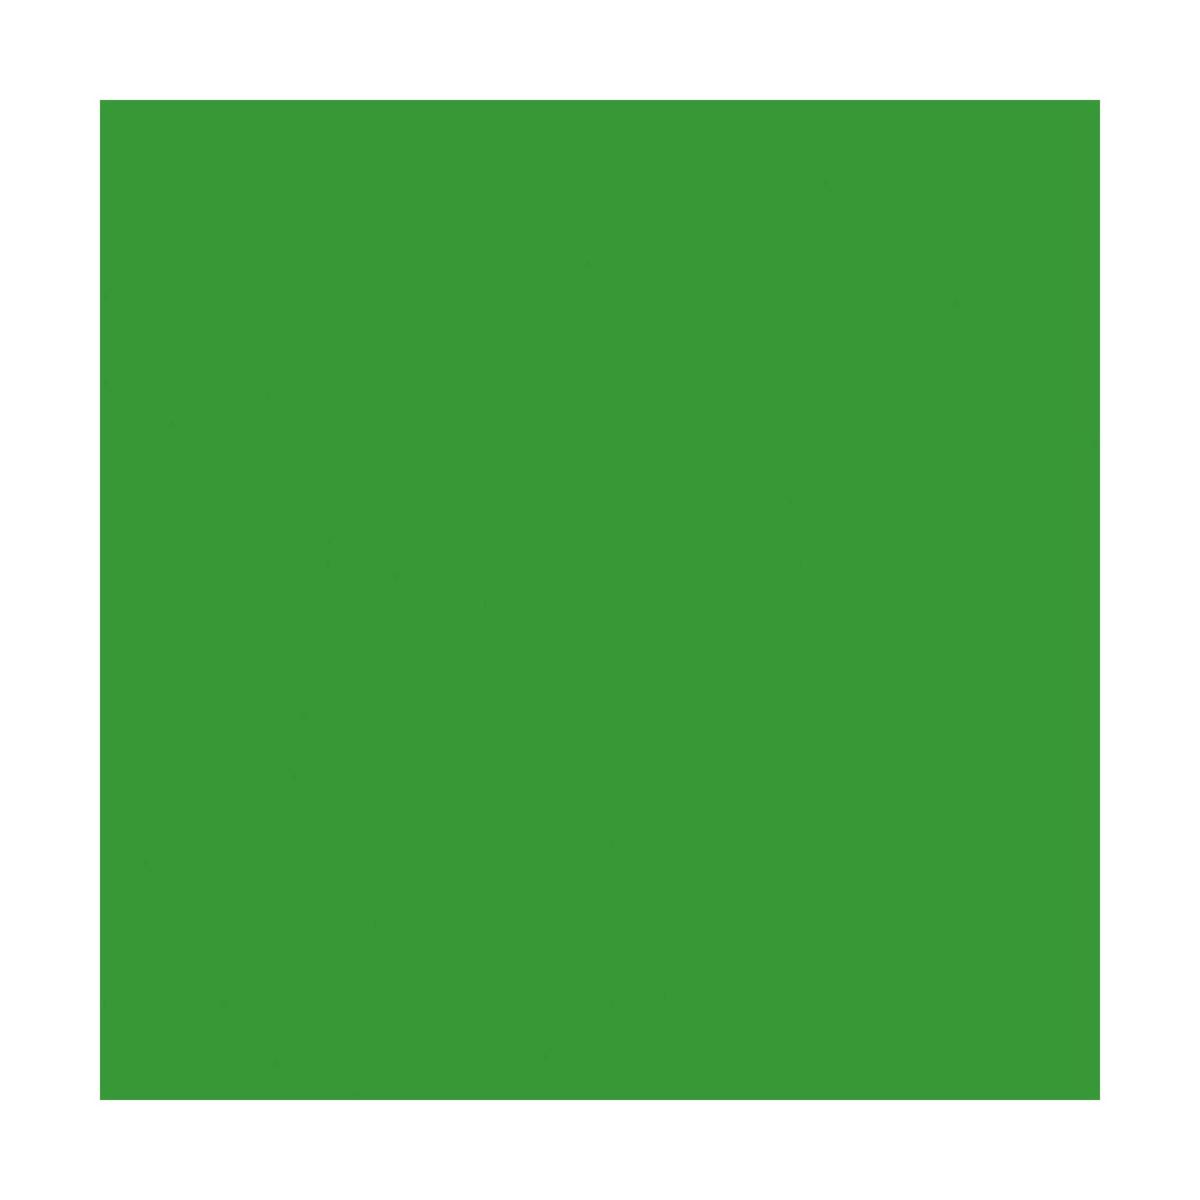 bd_backgrounds_132_veri_green_02